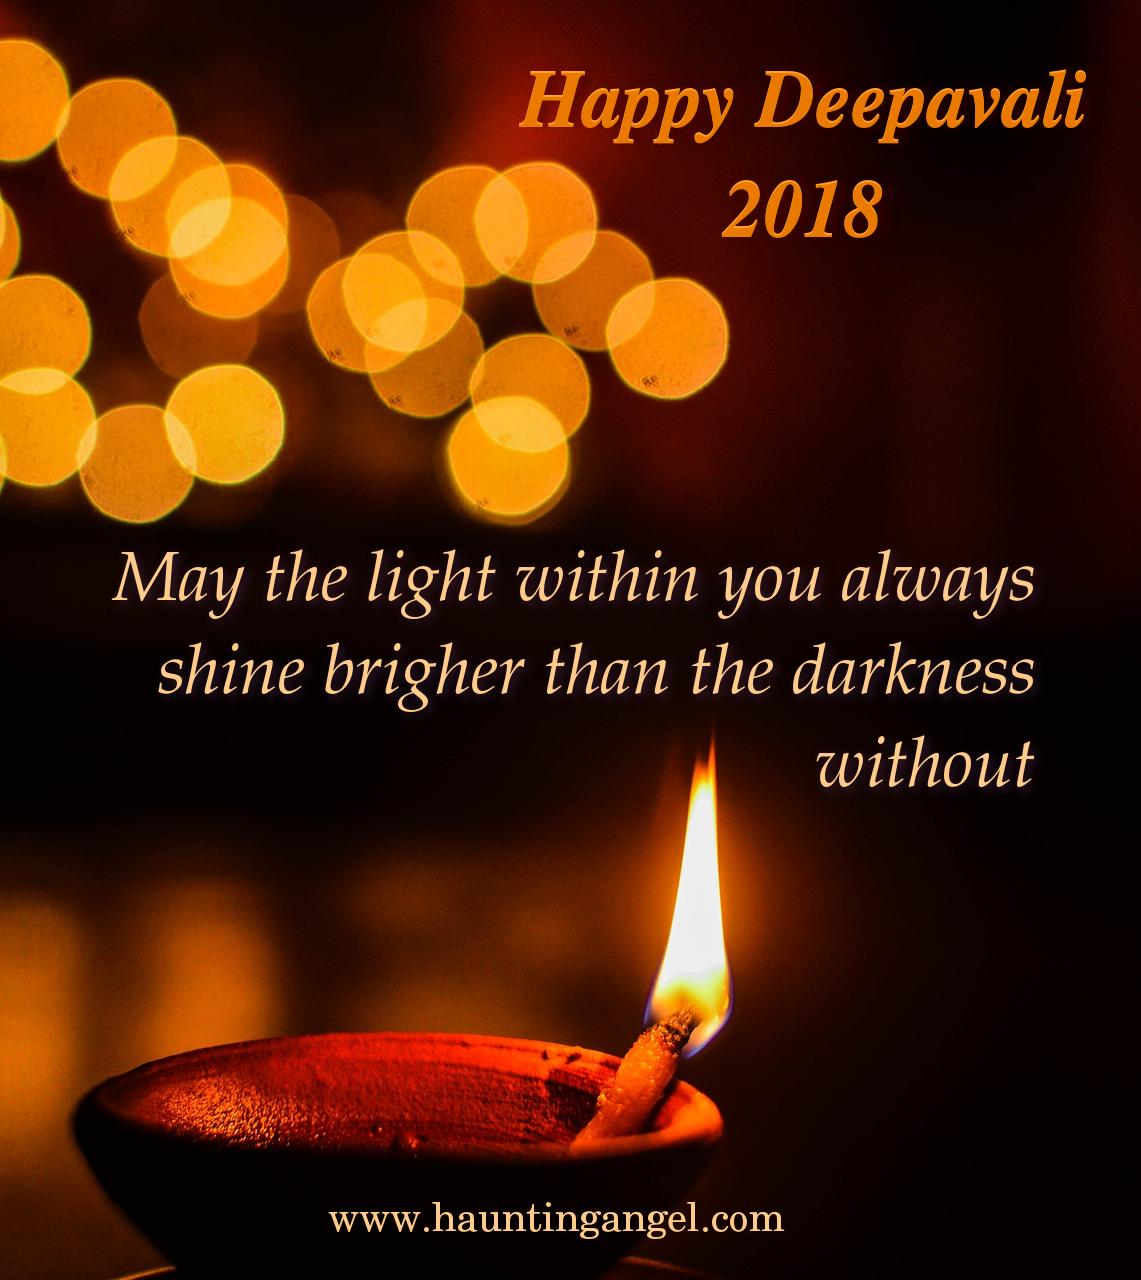 deepavali2018